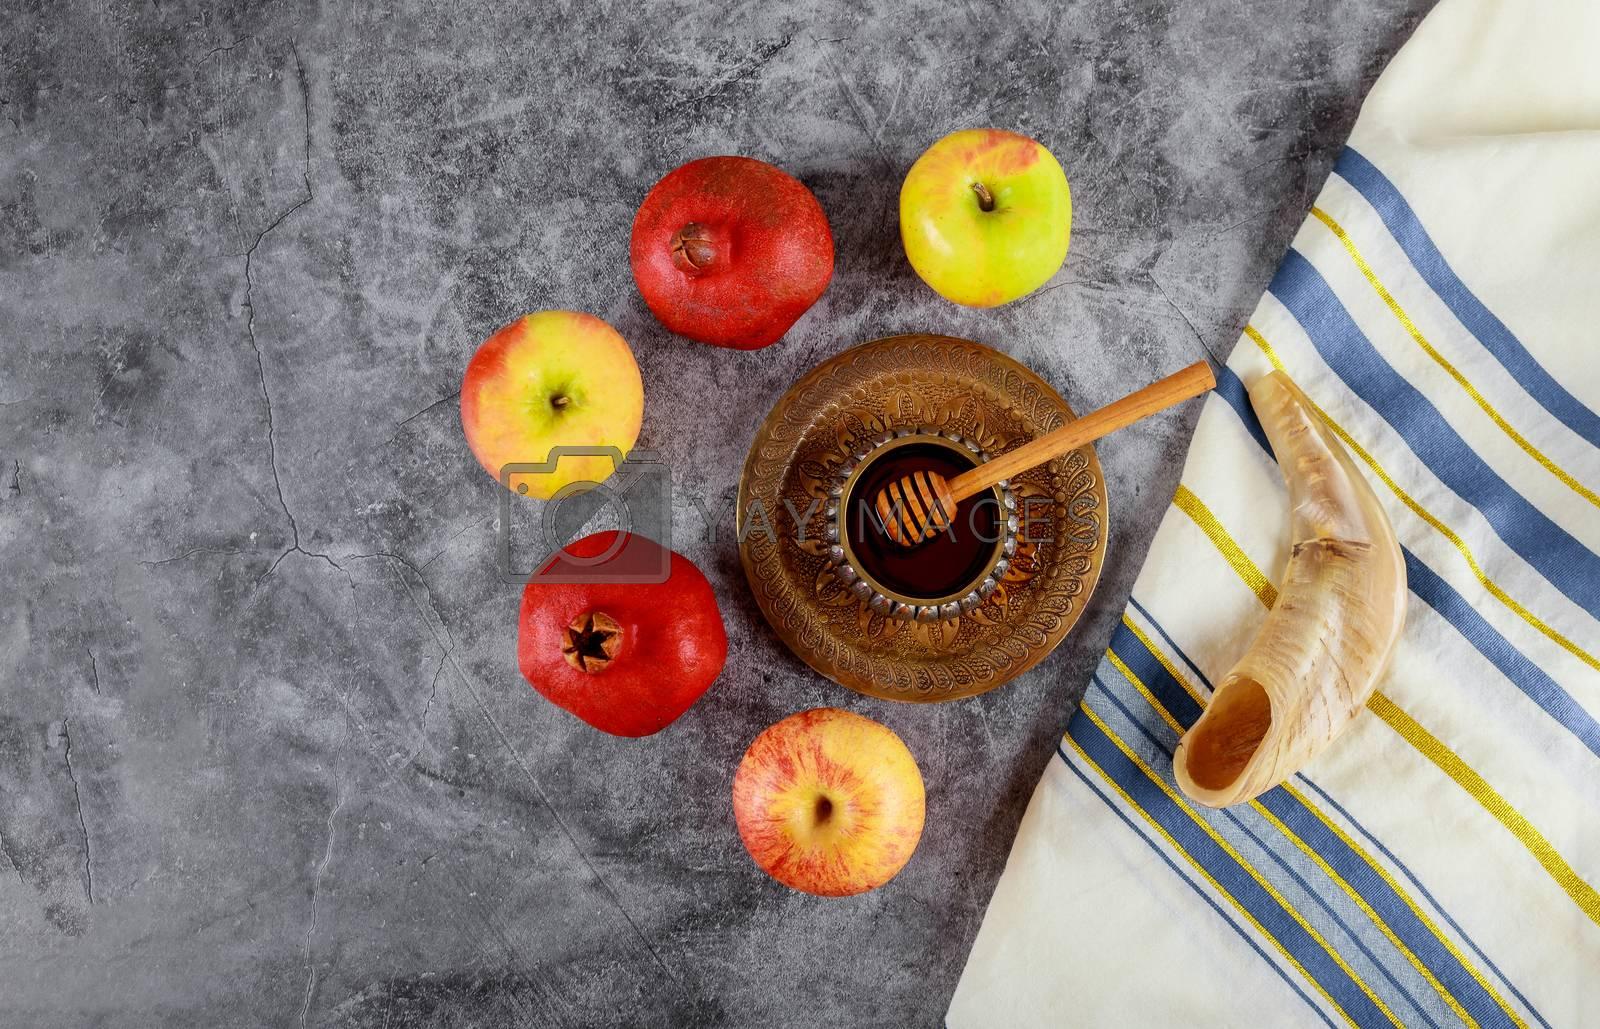 Synagogue of Rosh Hashanah apple and pomegranate, shofar talith